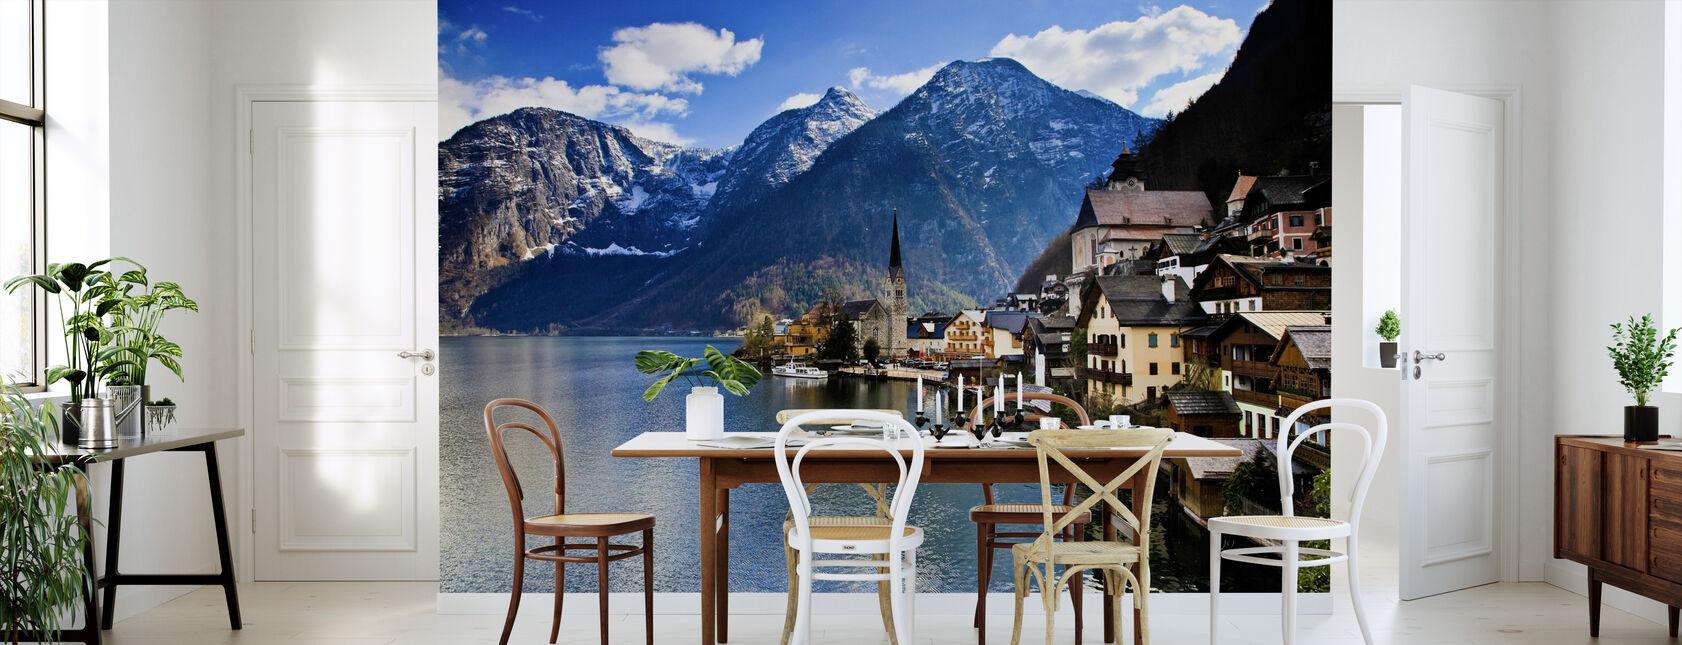 Small Austrian Mountain Village - Wallpaper - Kitchen